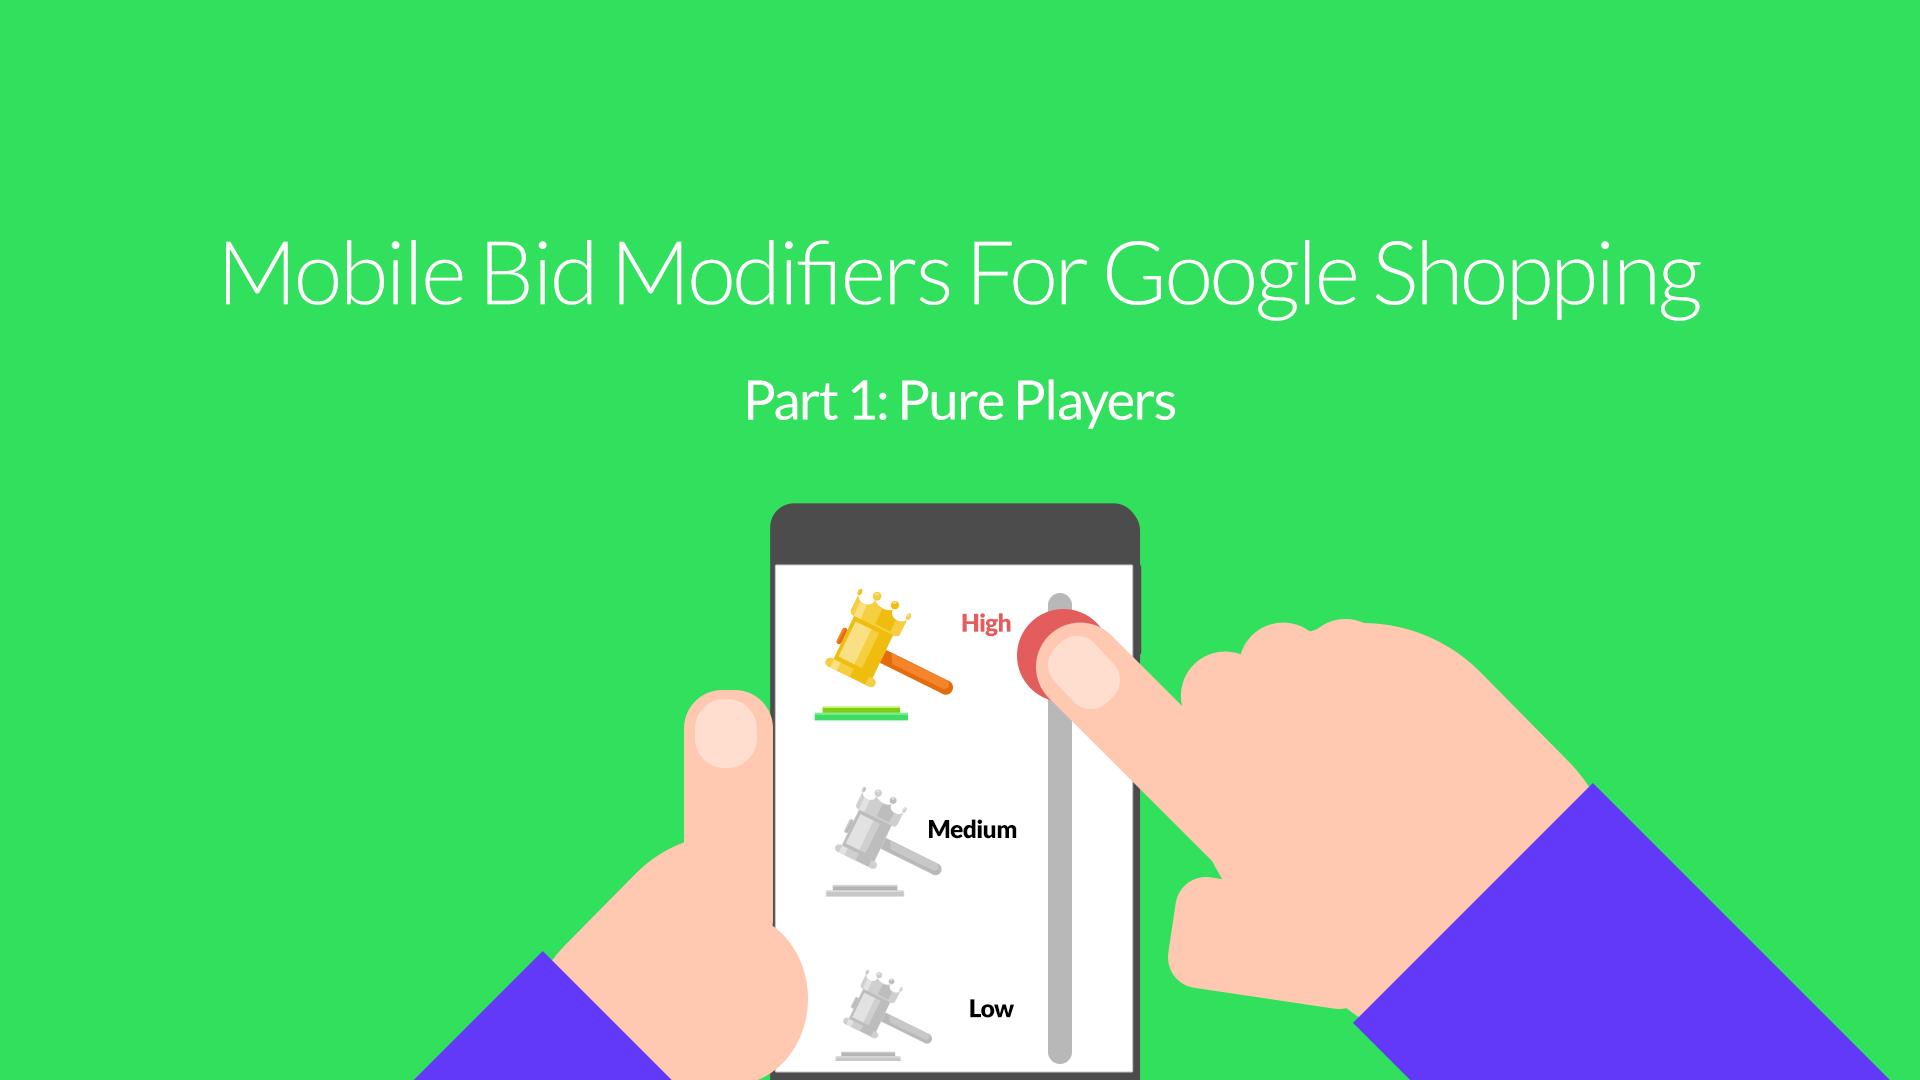 Mobile Bid Modifiers For Google Shopping